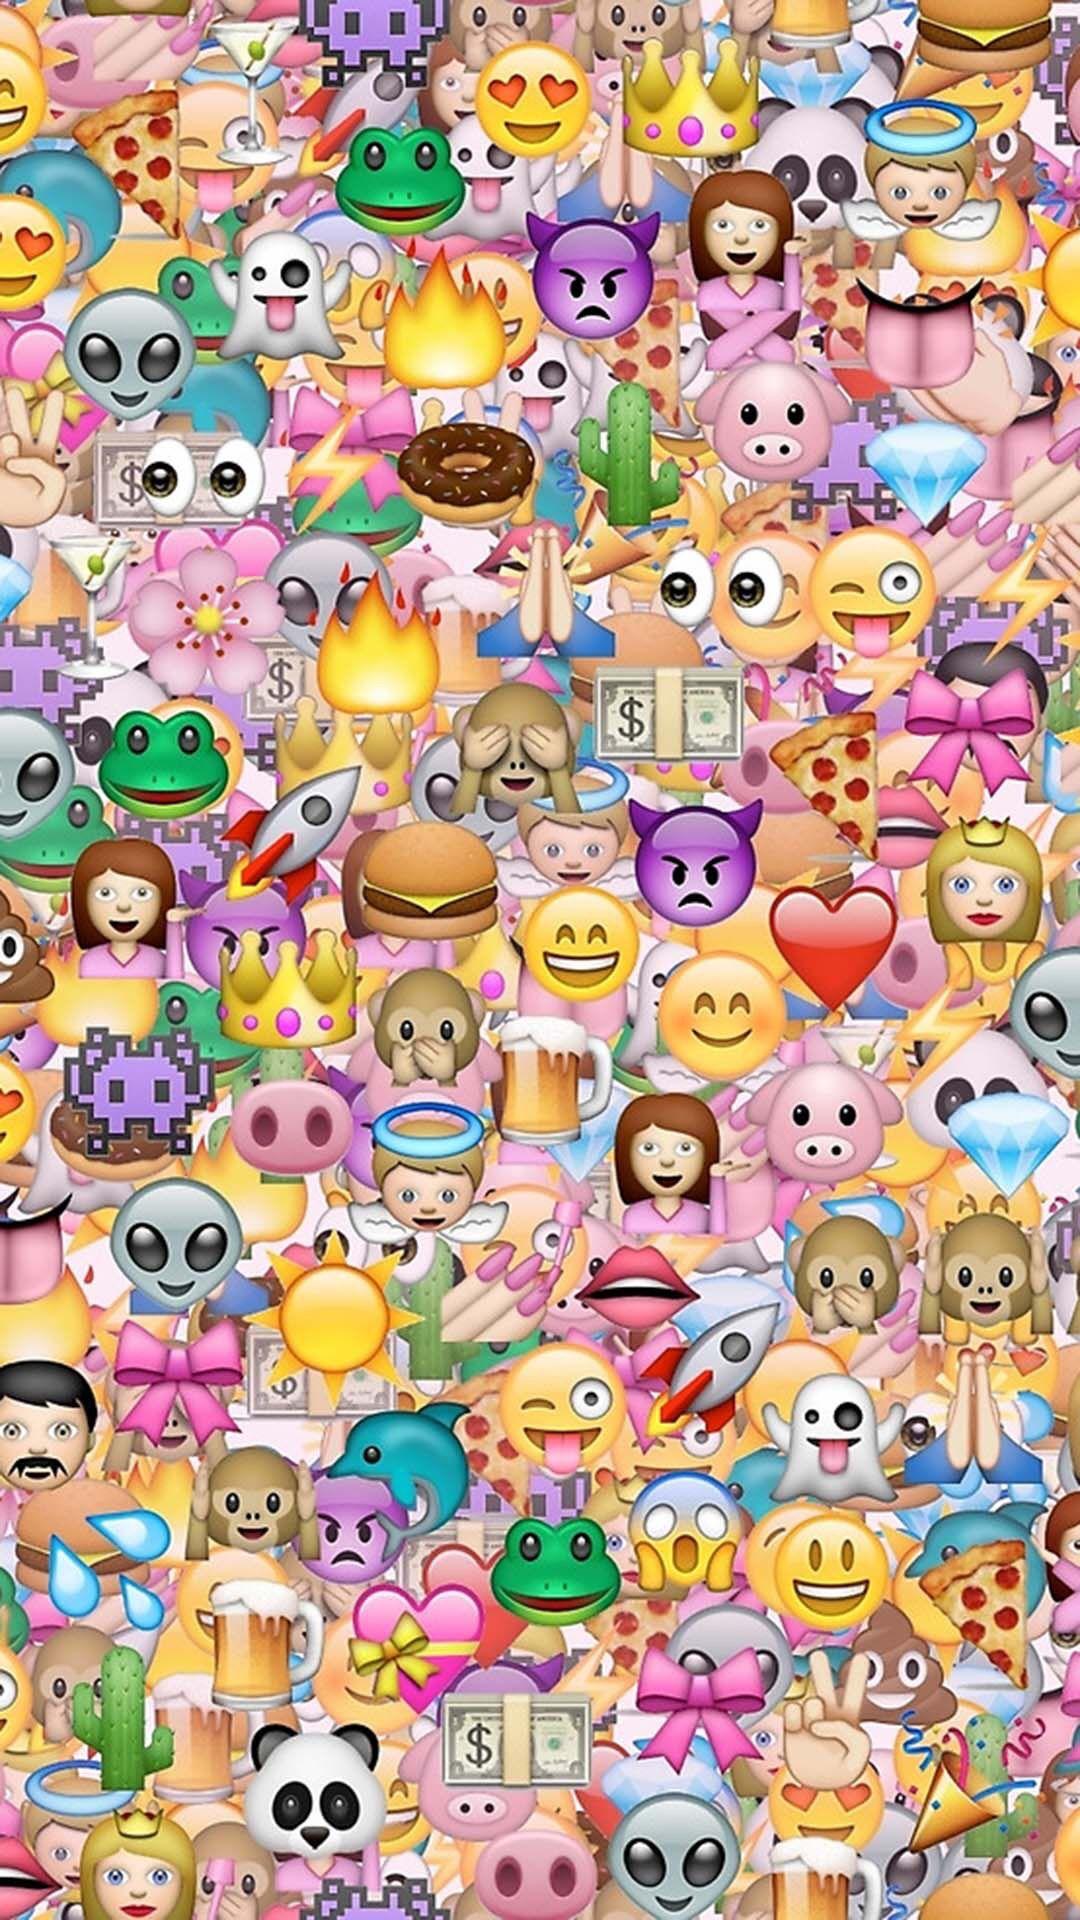 Emojis Gambar Hewan Lucu Seni Gambar Serigala